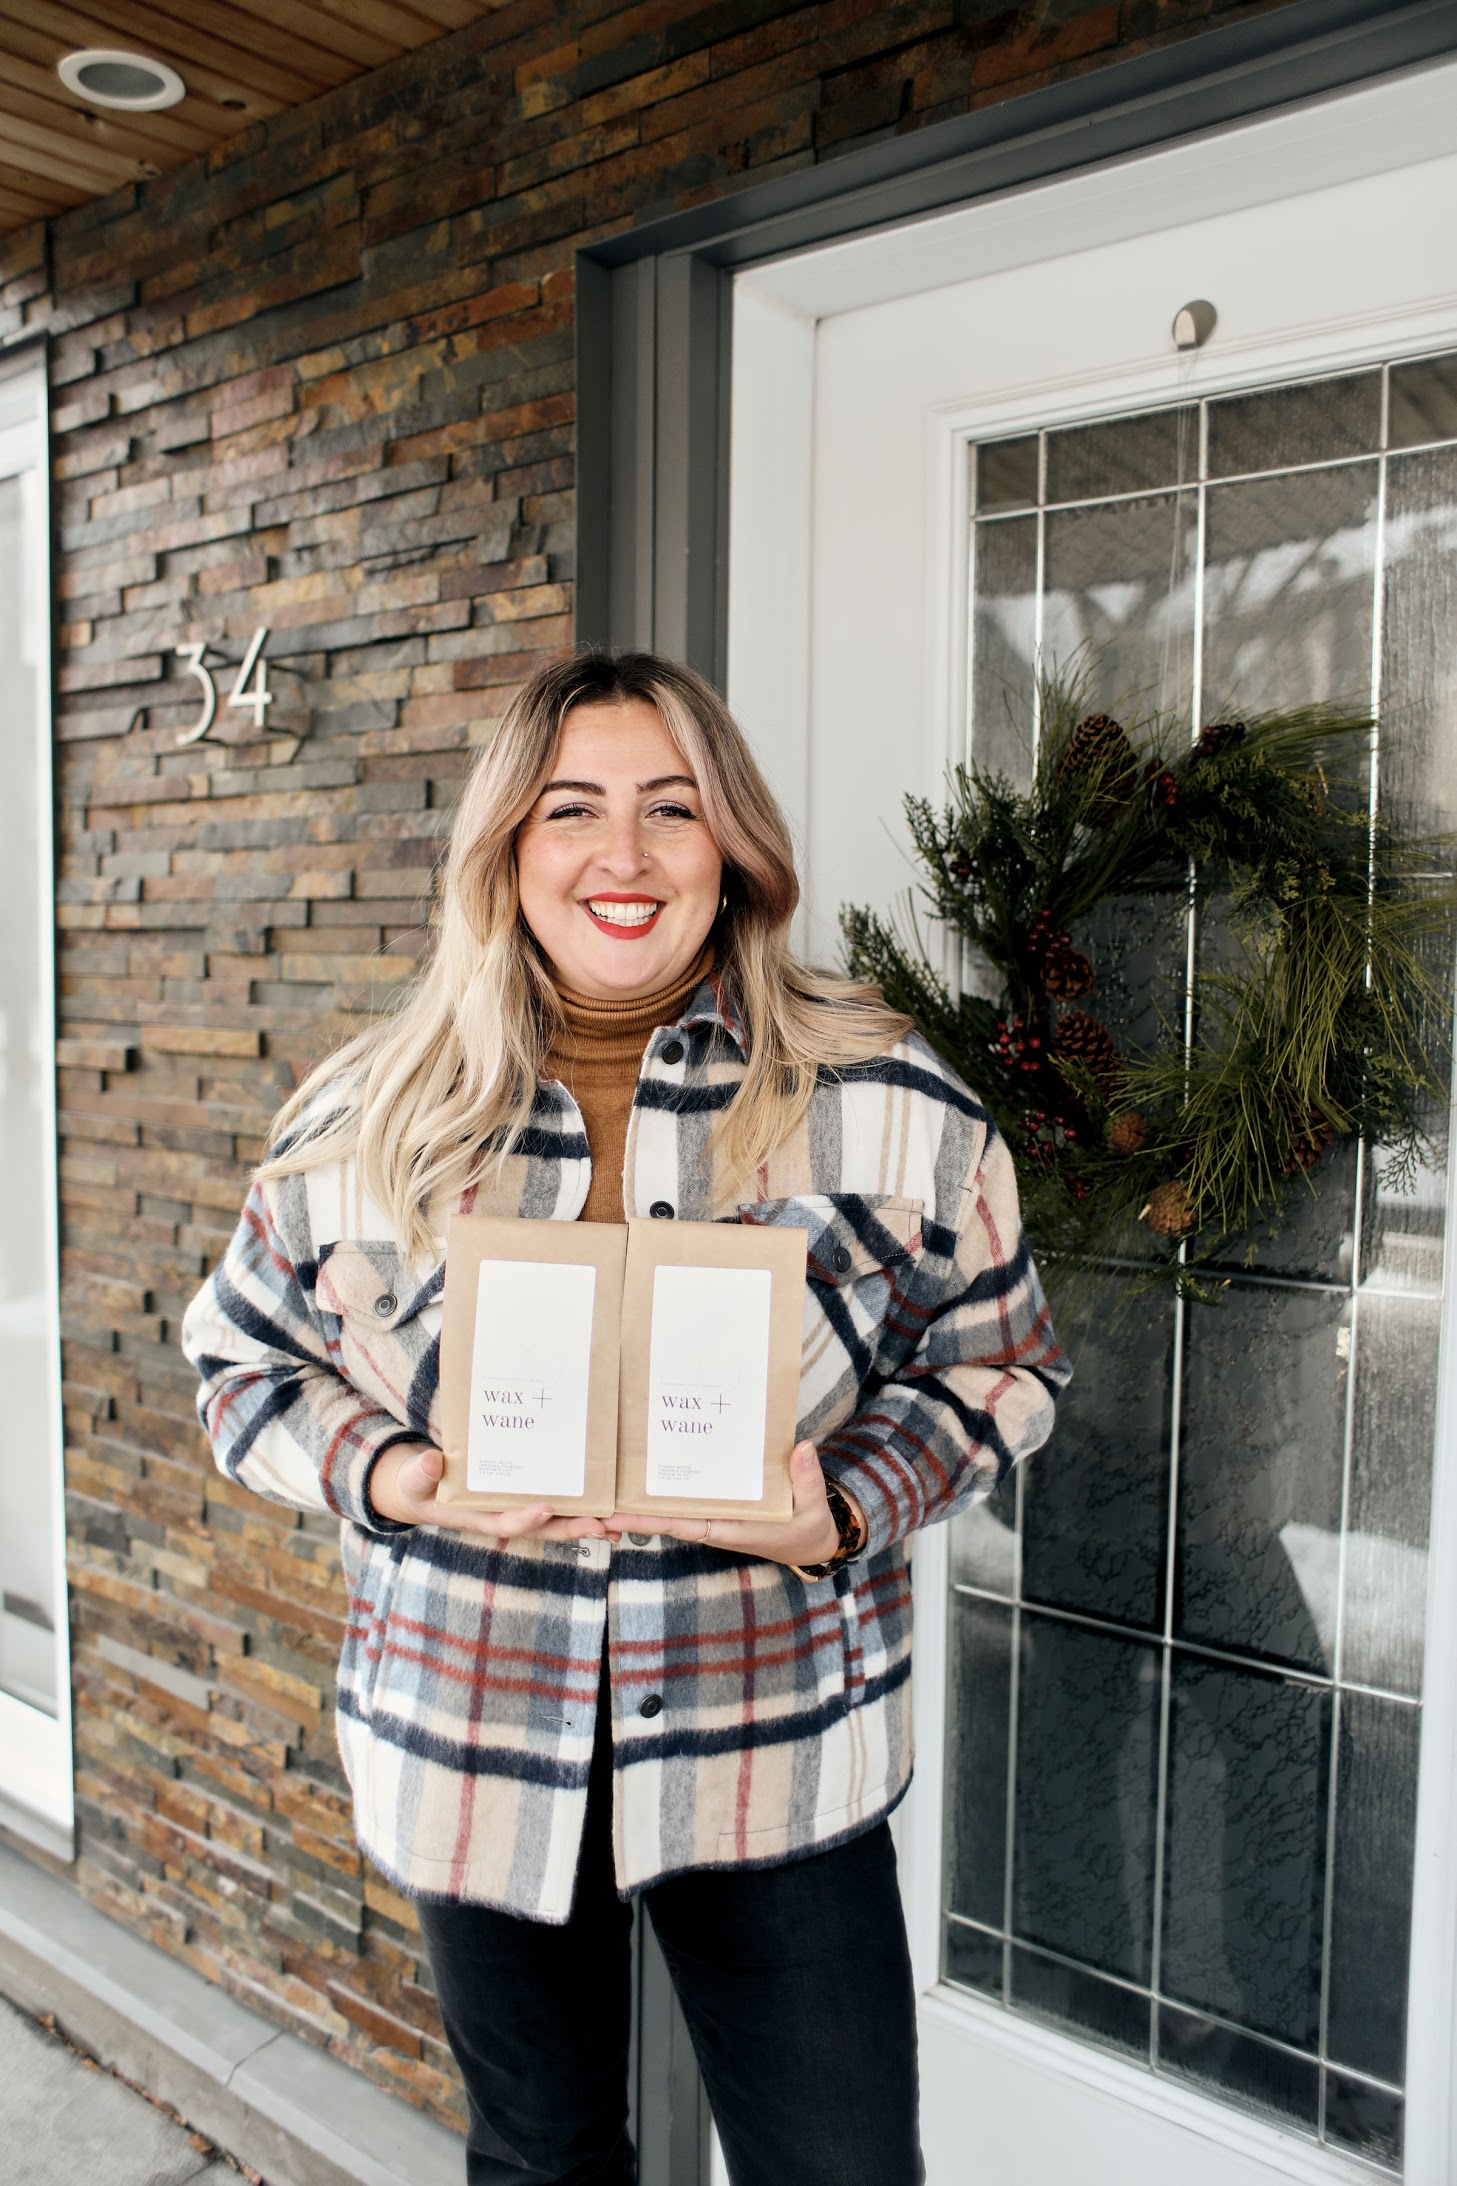 Chantal Sarkisian, a.k.a Chantsy, owner of Wax + Wane Coffee